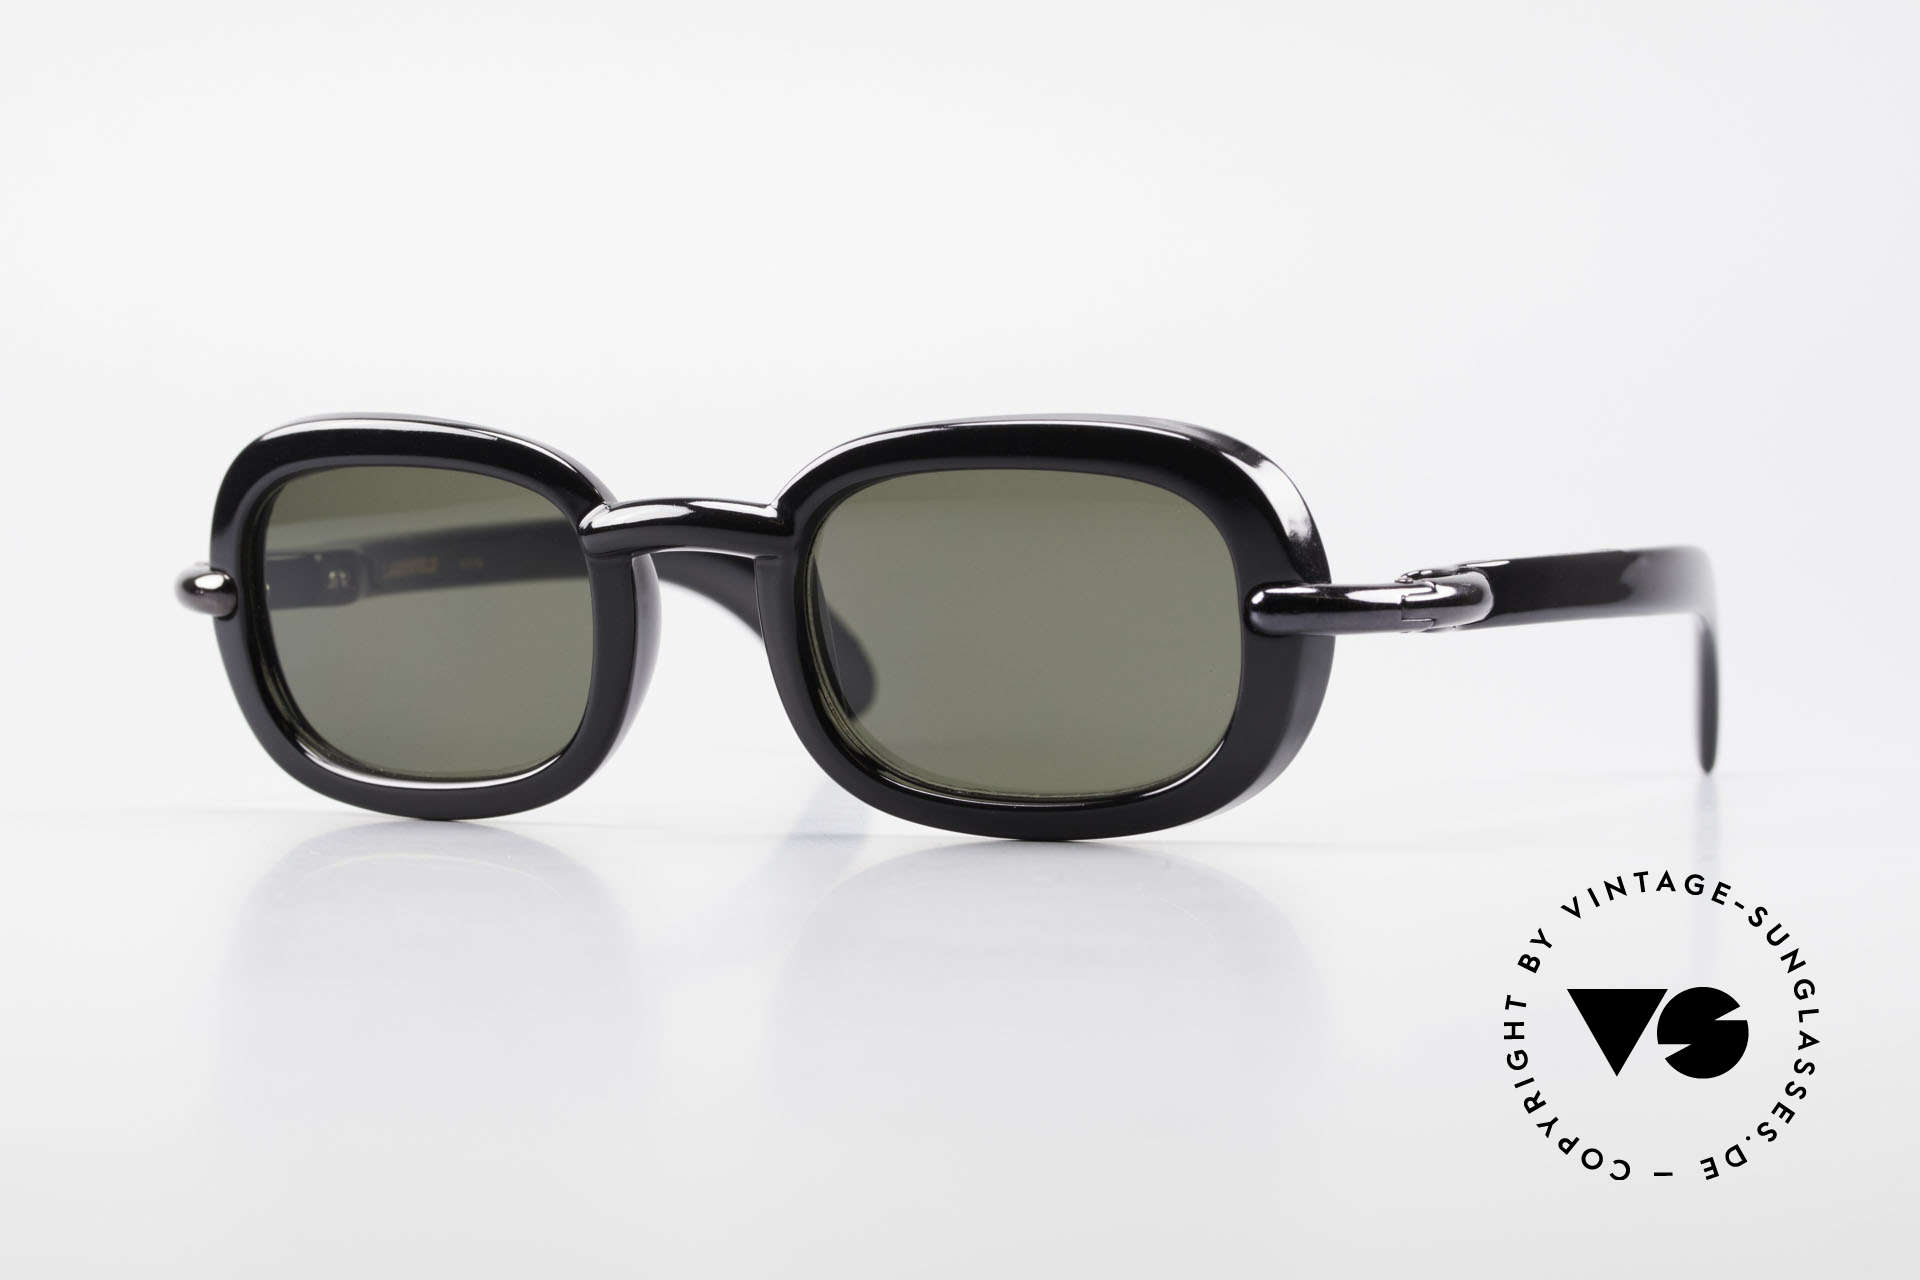 Karl Lagerfeld 4117 Rare 90's Ladies Sunglasses, genuine vintage designer sunglasses by Karl Lagerfeld, Made for Women